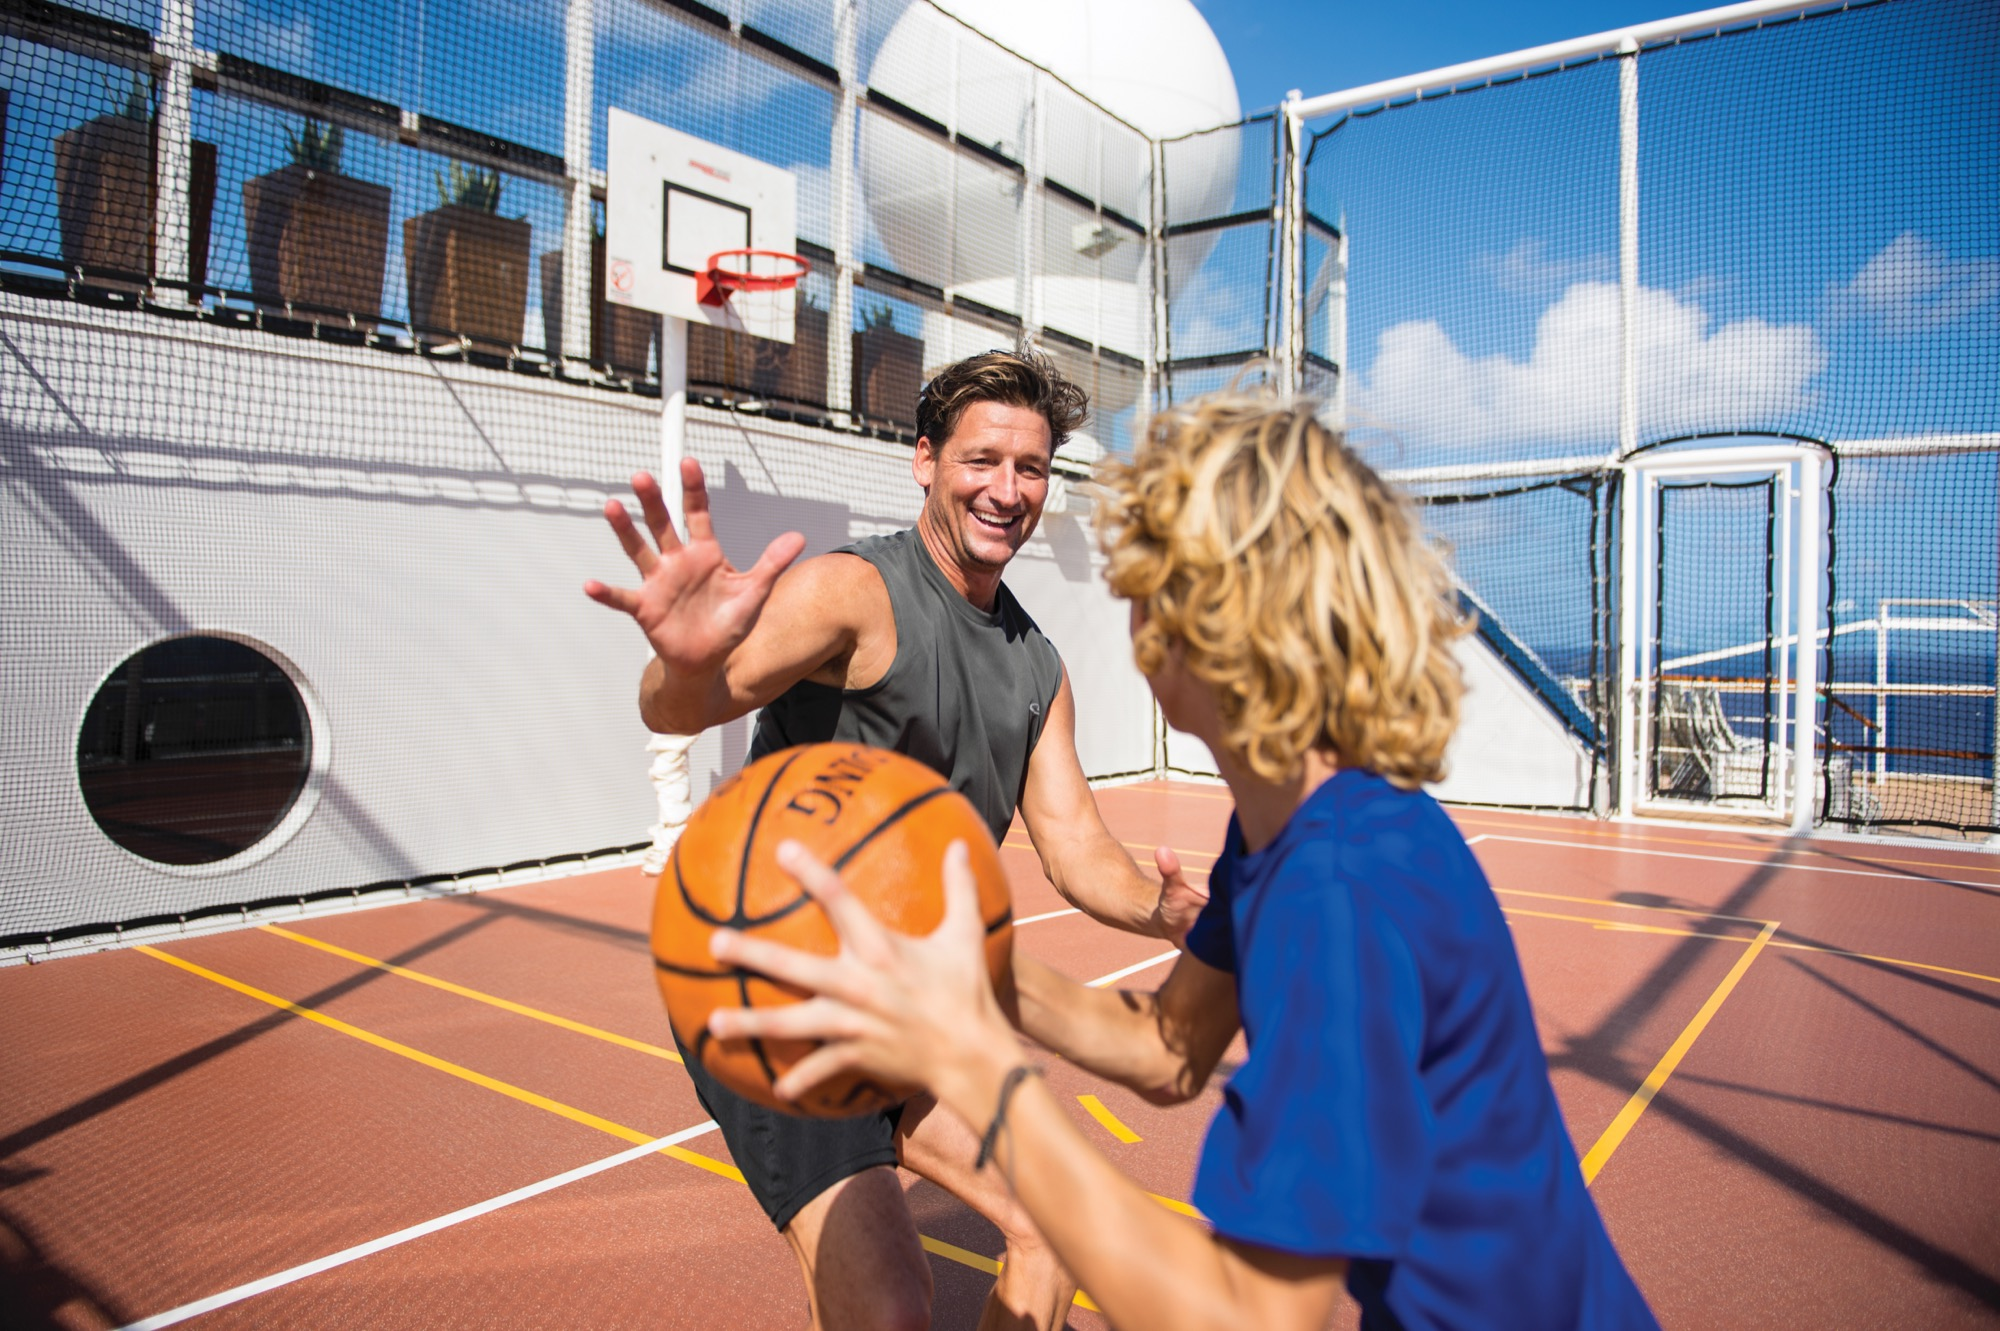 Celebrity Cruises Celebrity Equinox Interior CEL_RF_BasketballCourt_TH45439.jpg